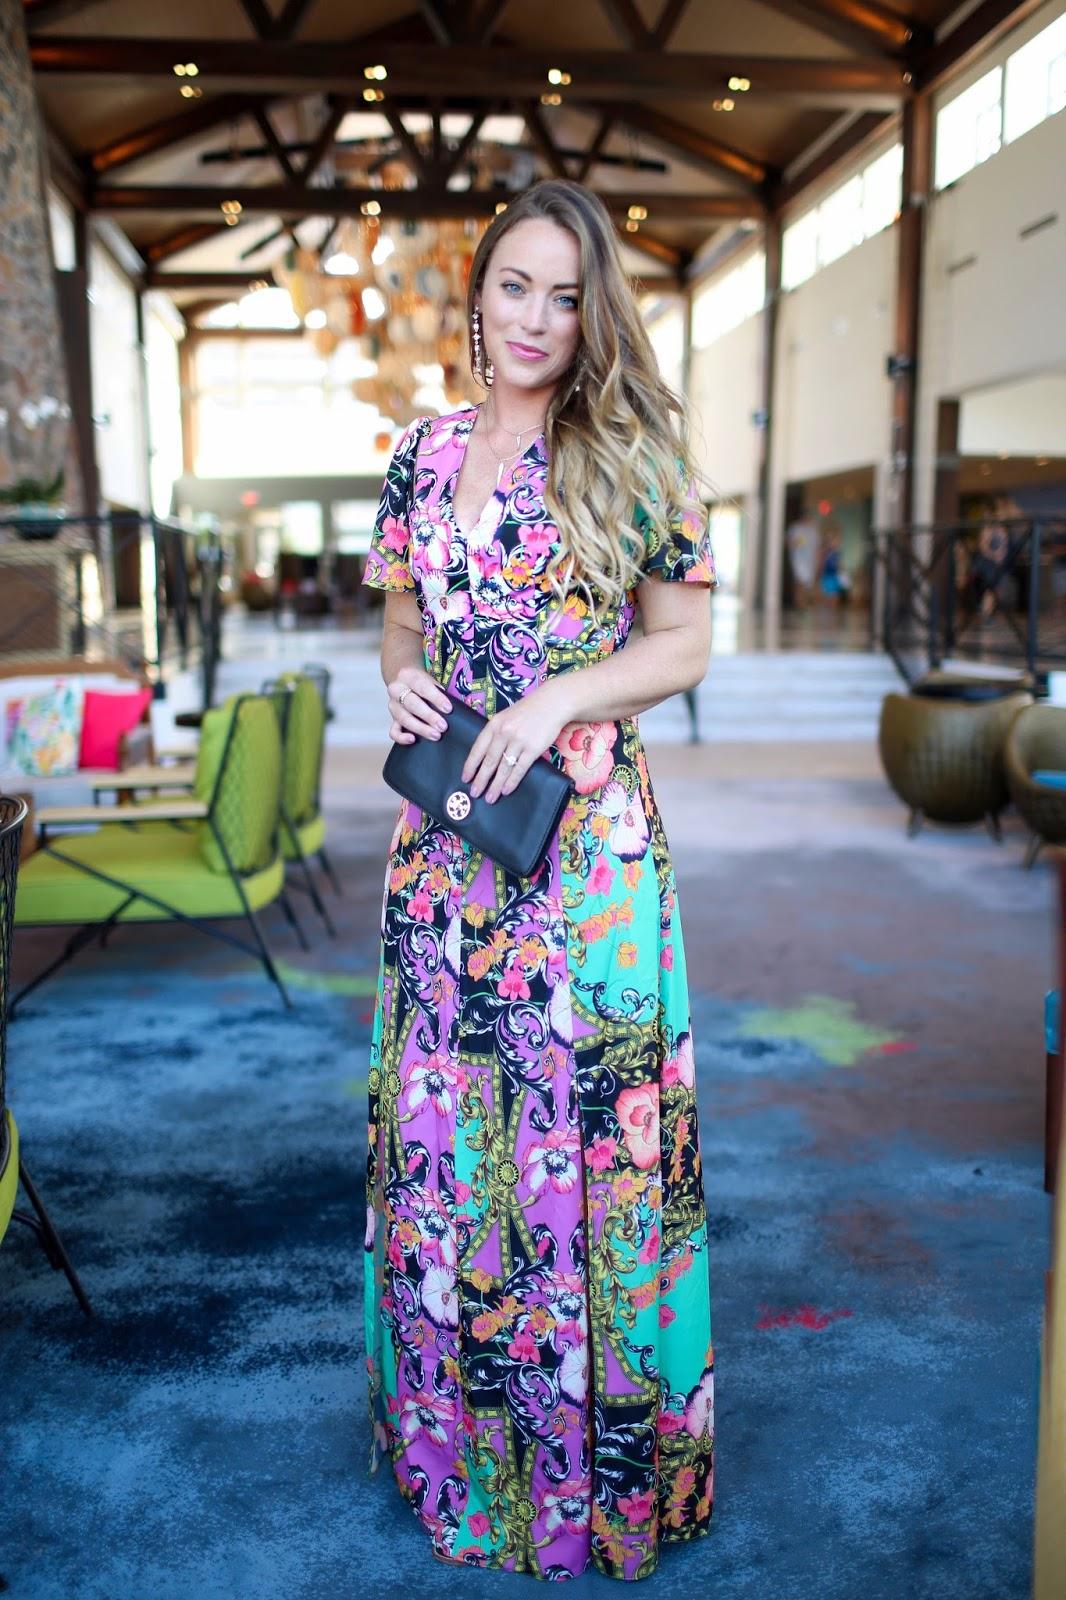 ASOS Scarf Print Maxi Dress at Loews Sapphire Falls Resort